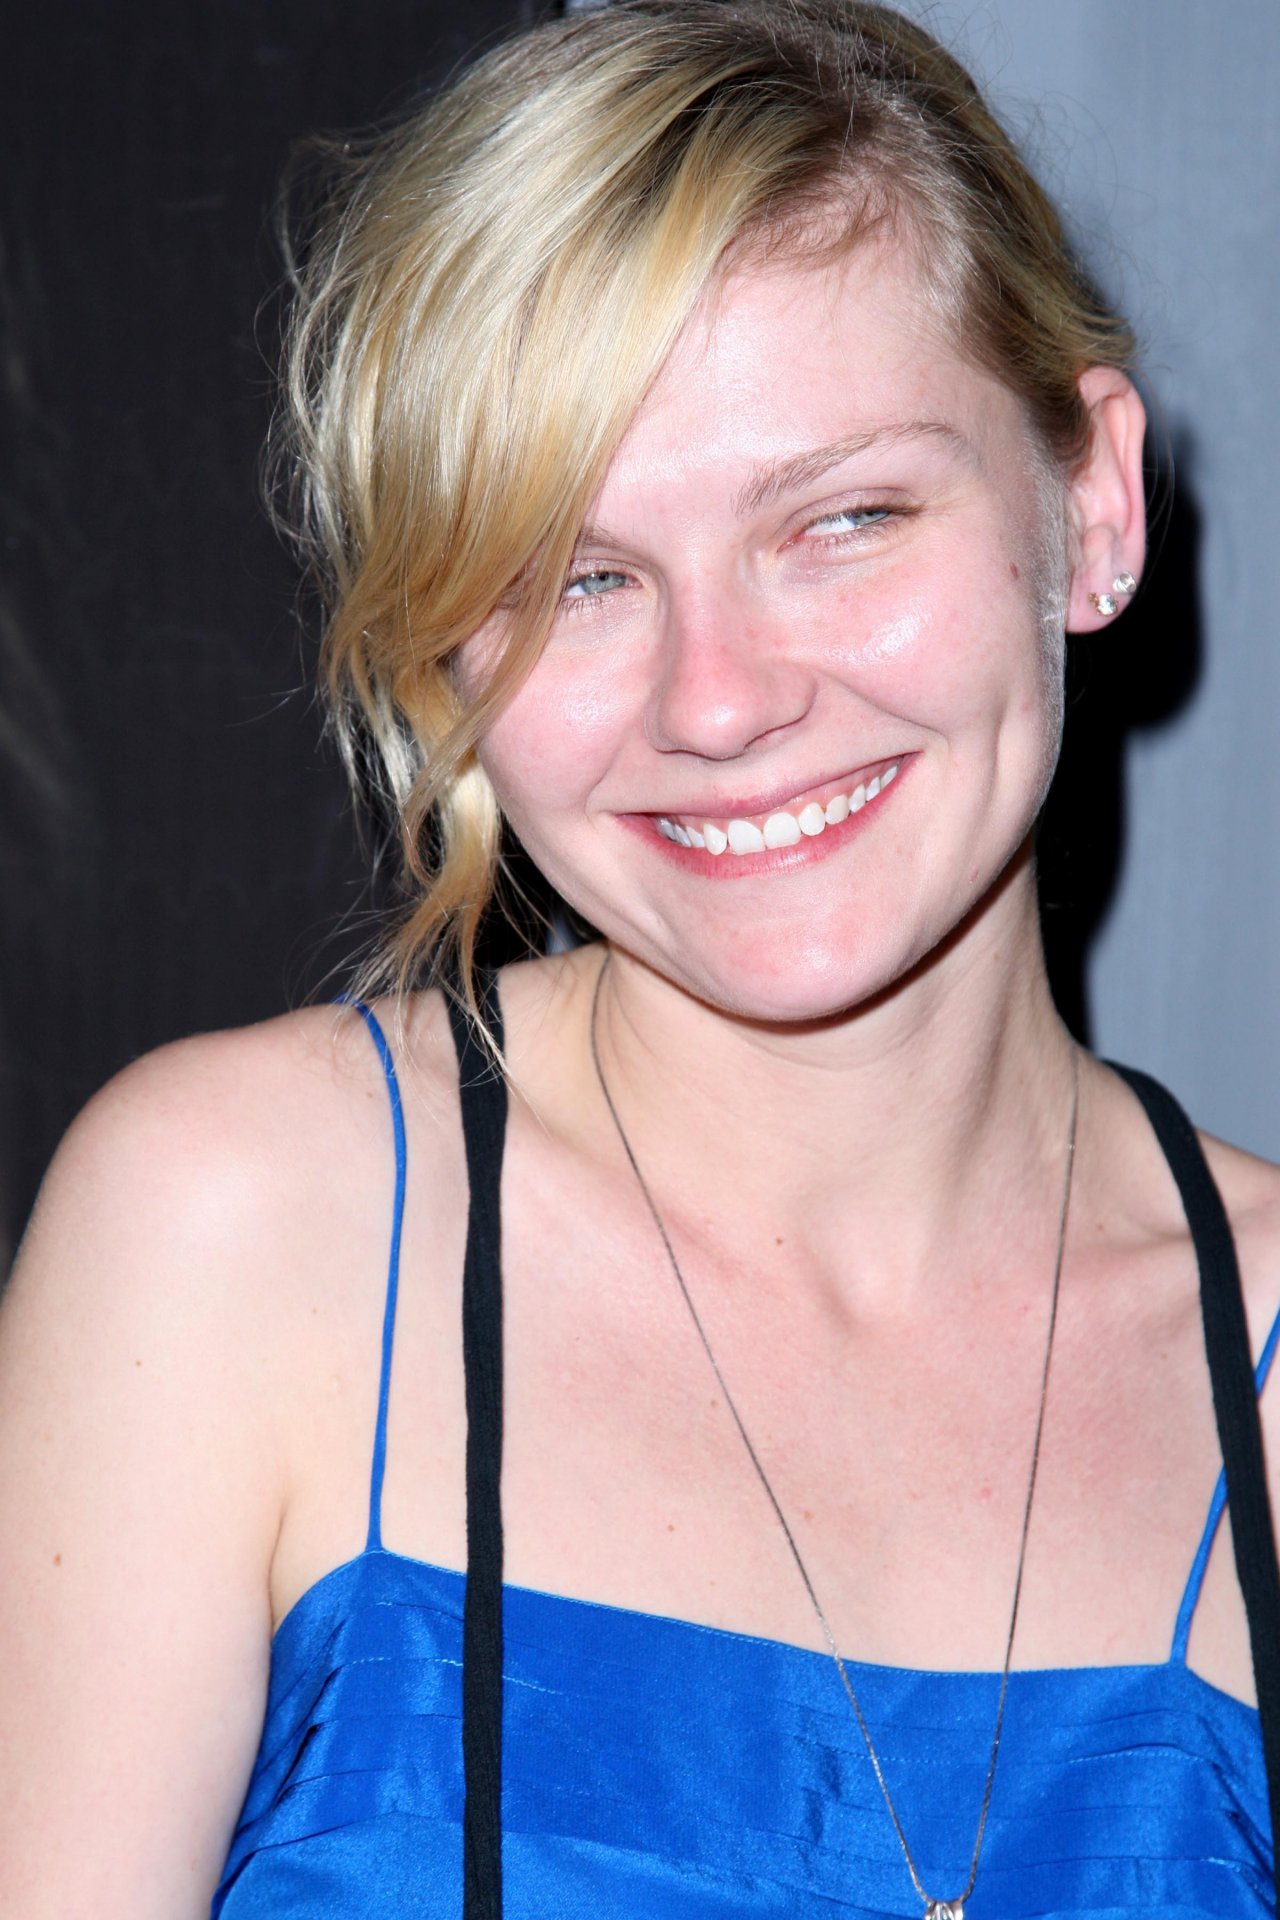 Kirsten Dunst - Images Colection